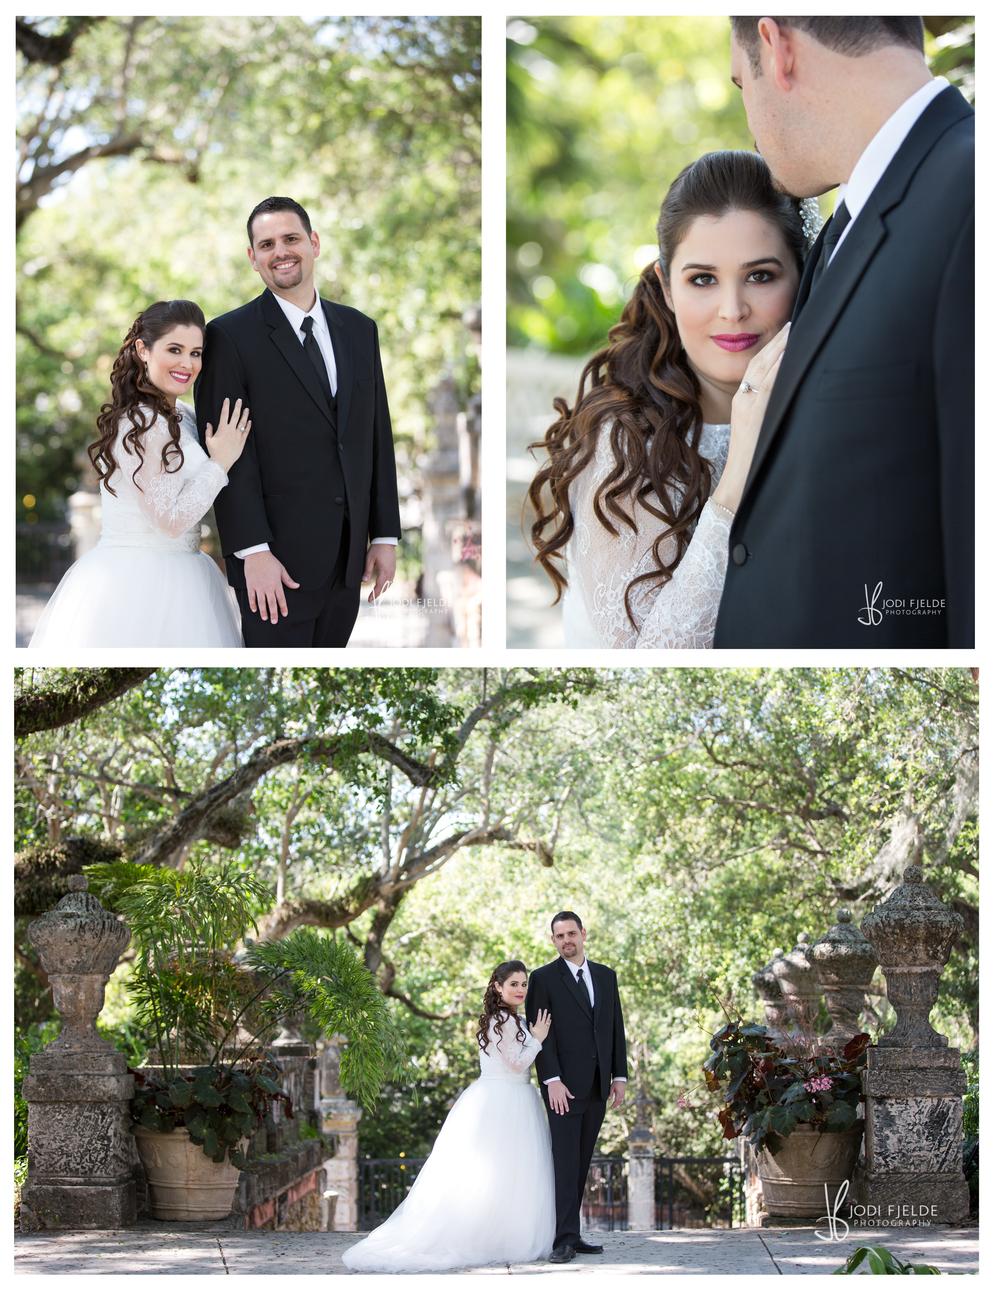 Vizcaya_Miami_Florida_Bridal_Wedding_Portraits_Jodi_Fjelde_Photography-5.jpg